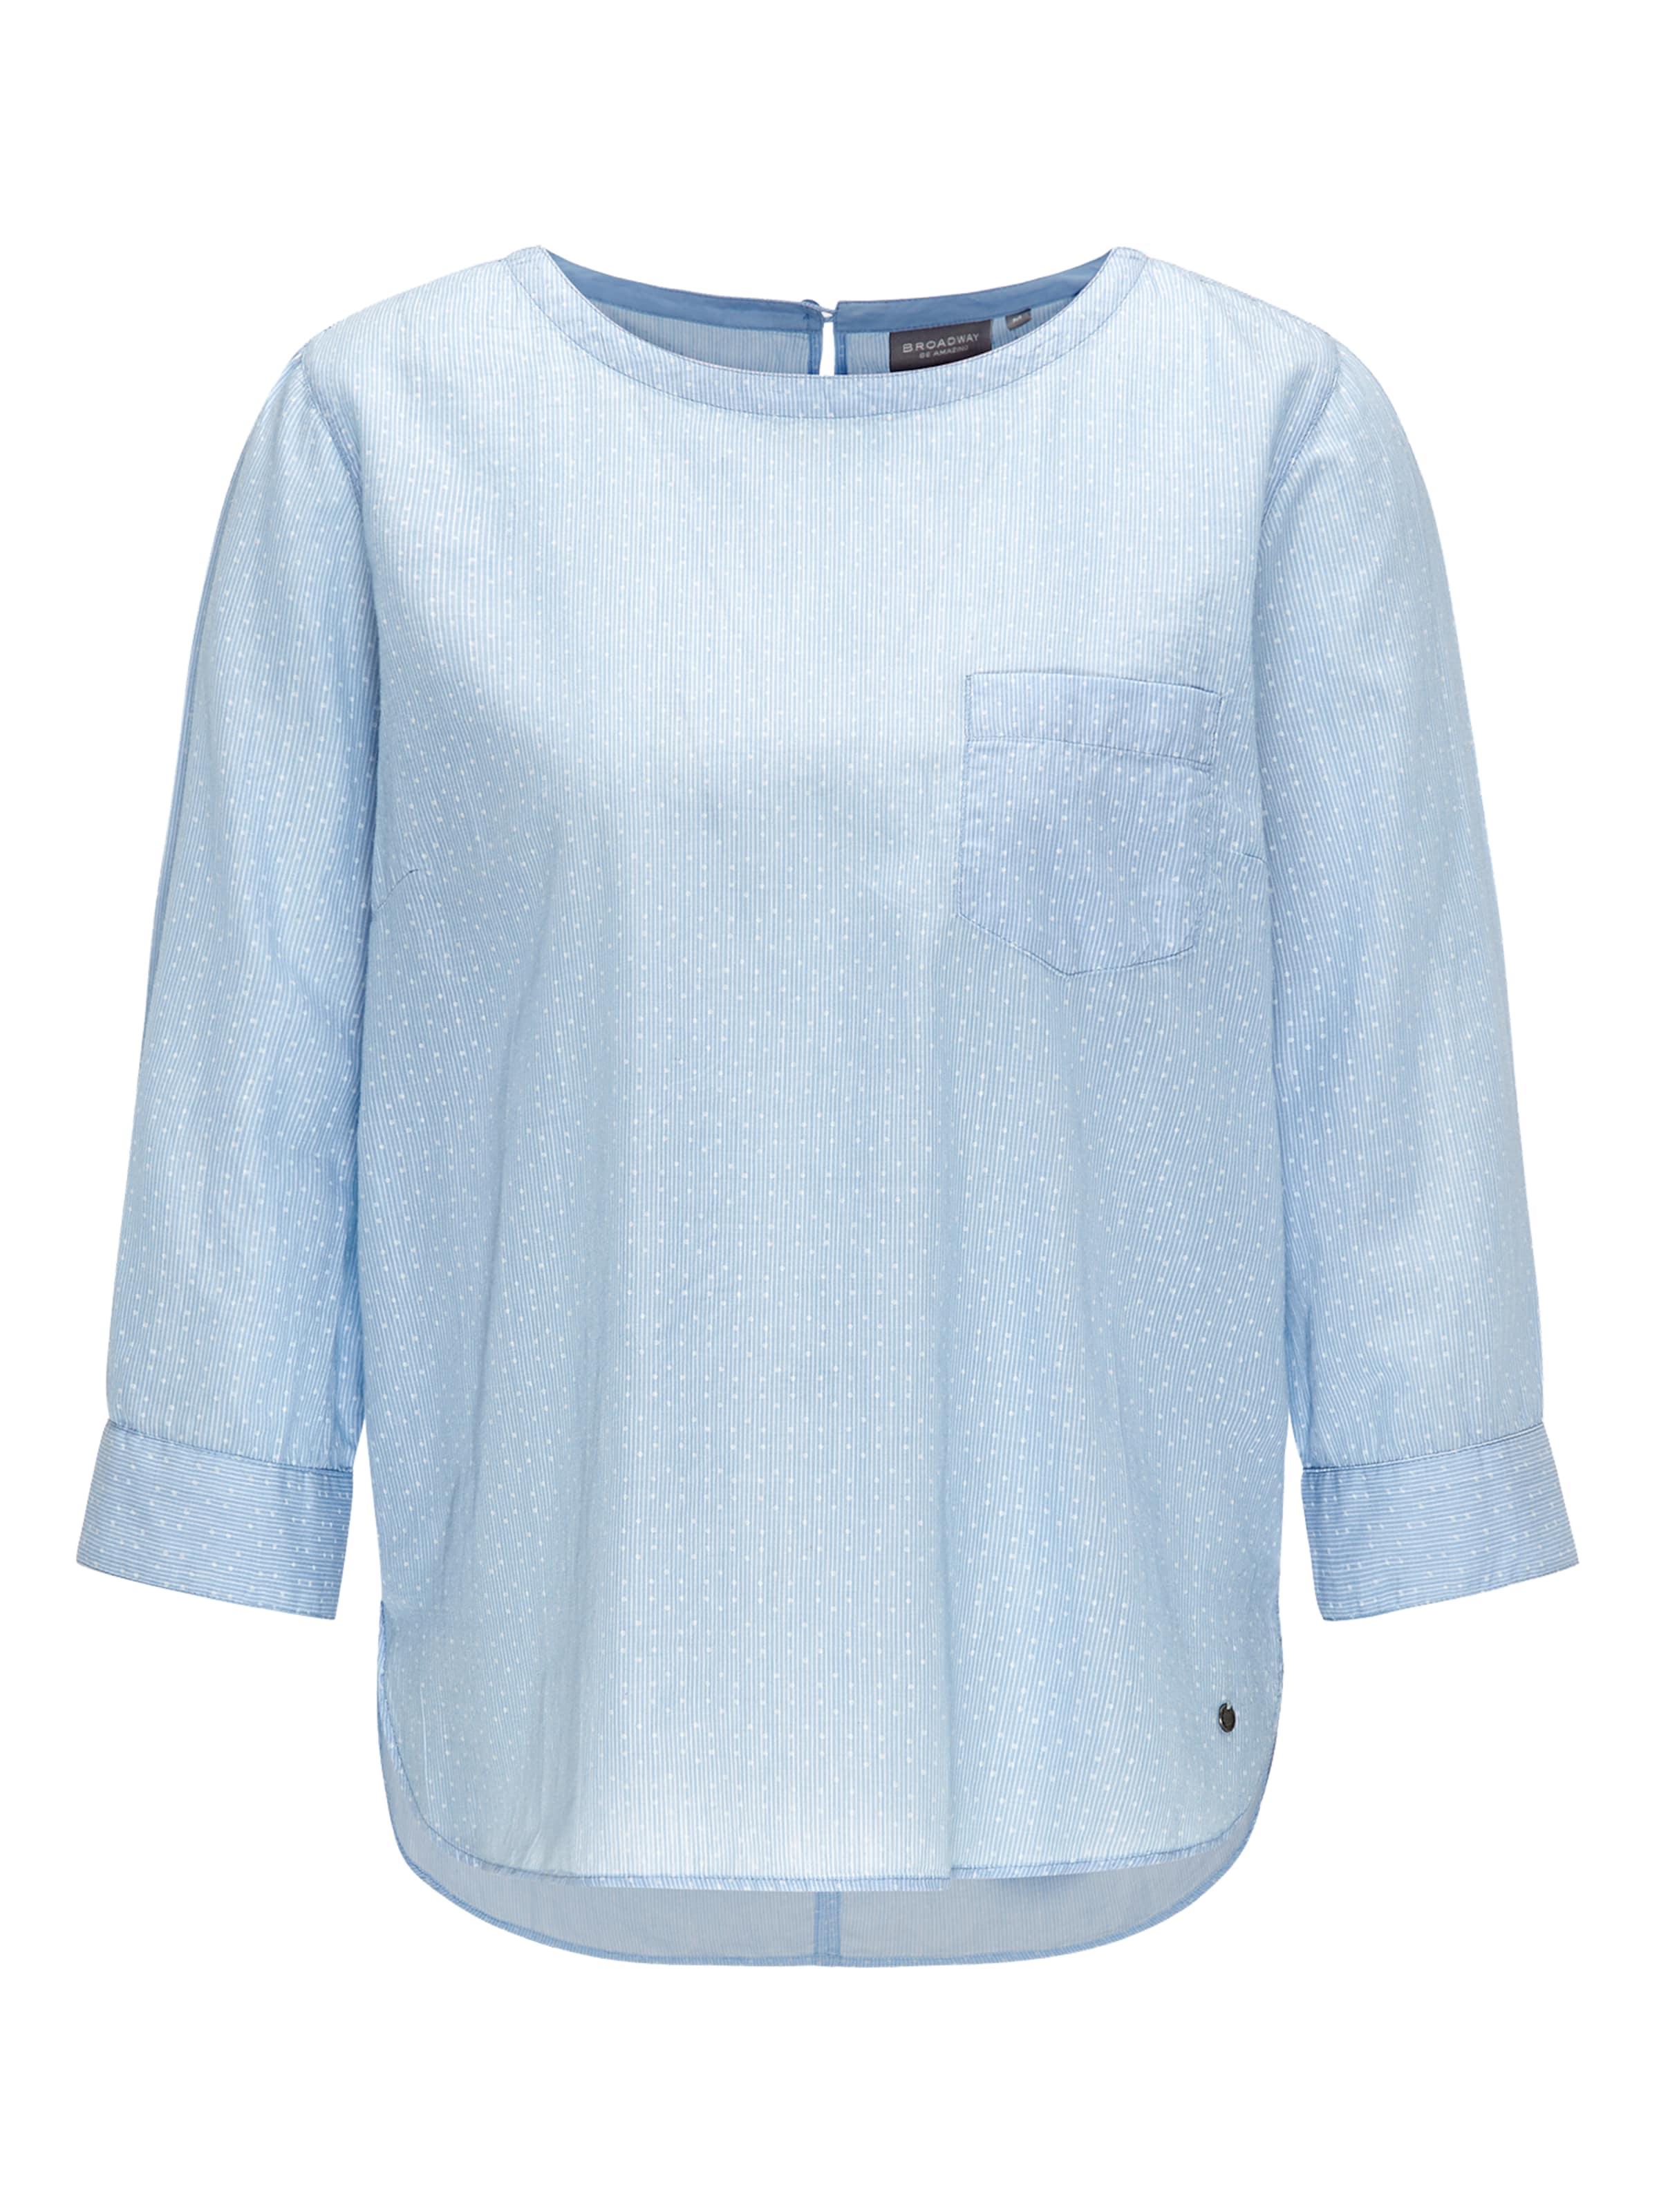 'pales' In HellblauWeiß Fashion Nyc Broadway Bluse H2D9IWEY